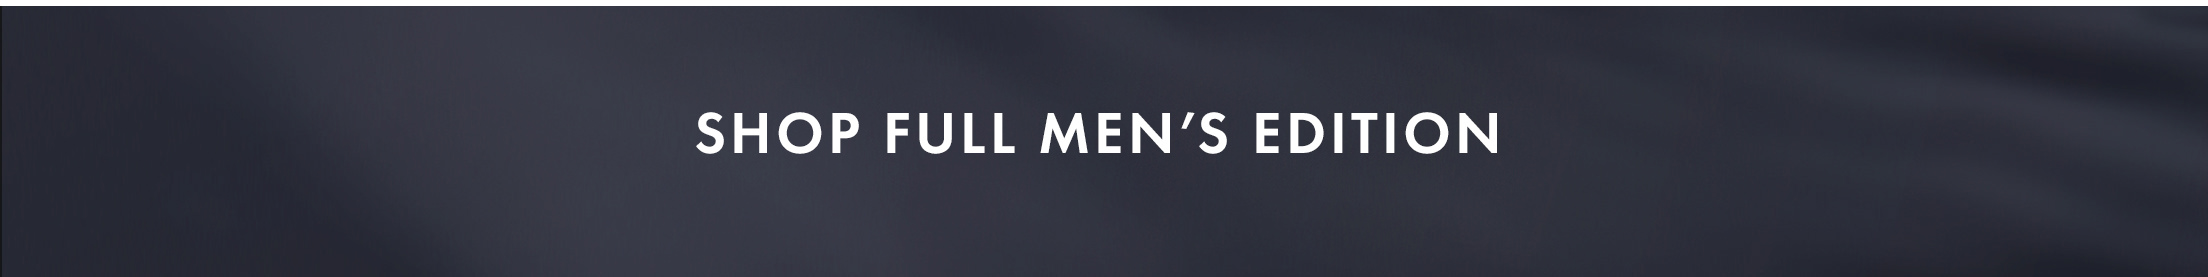 Shop Full Men's Edition